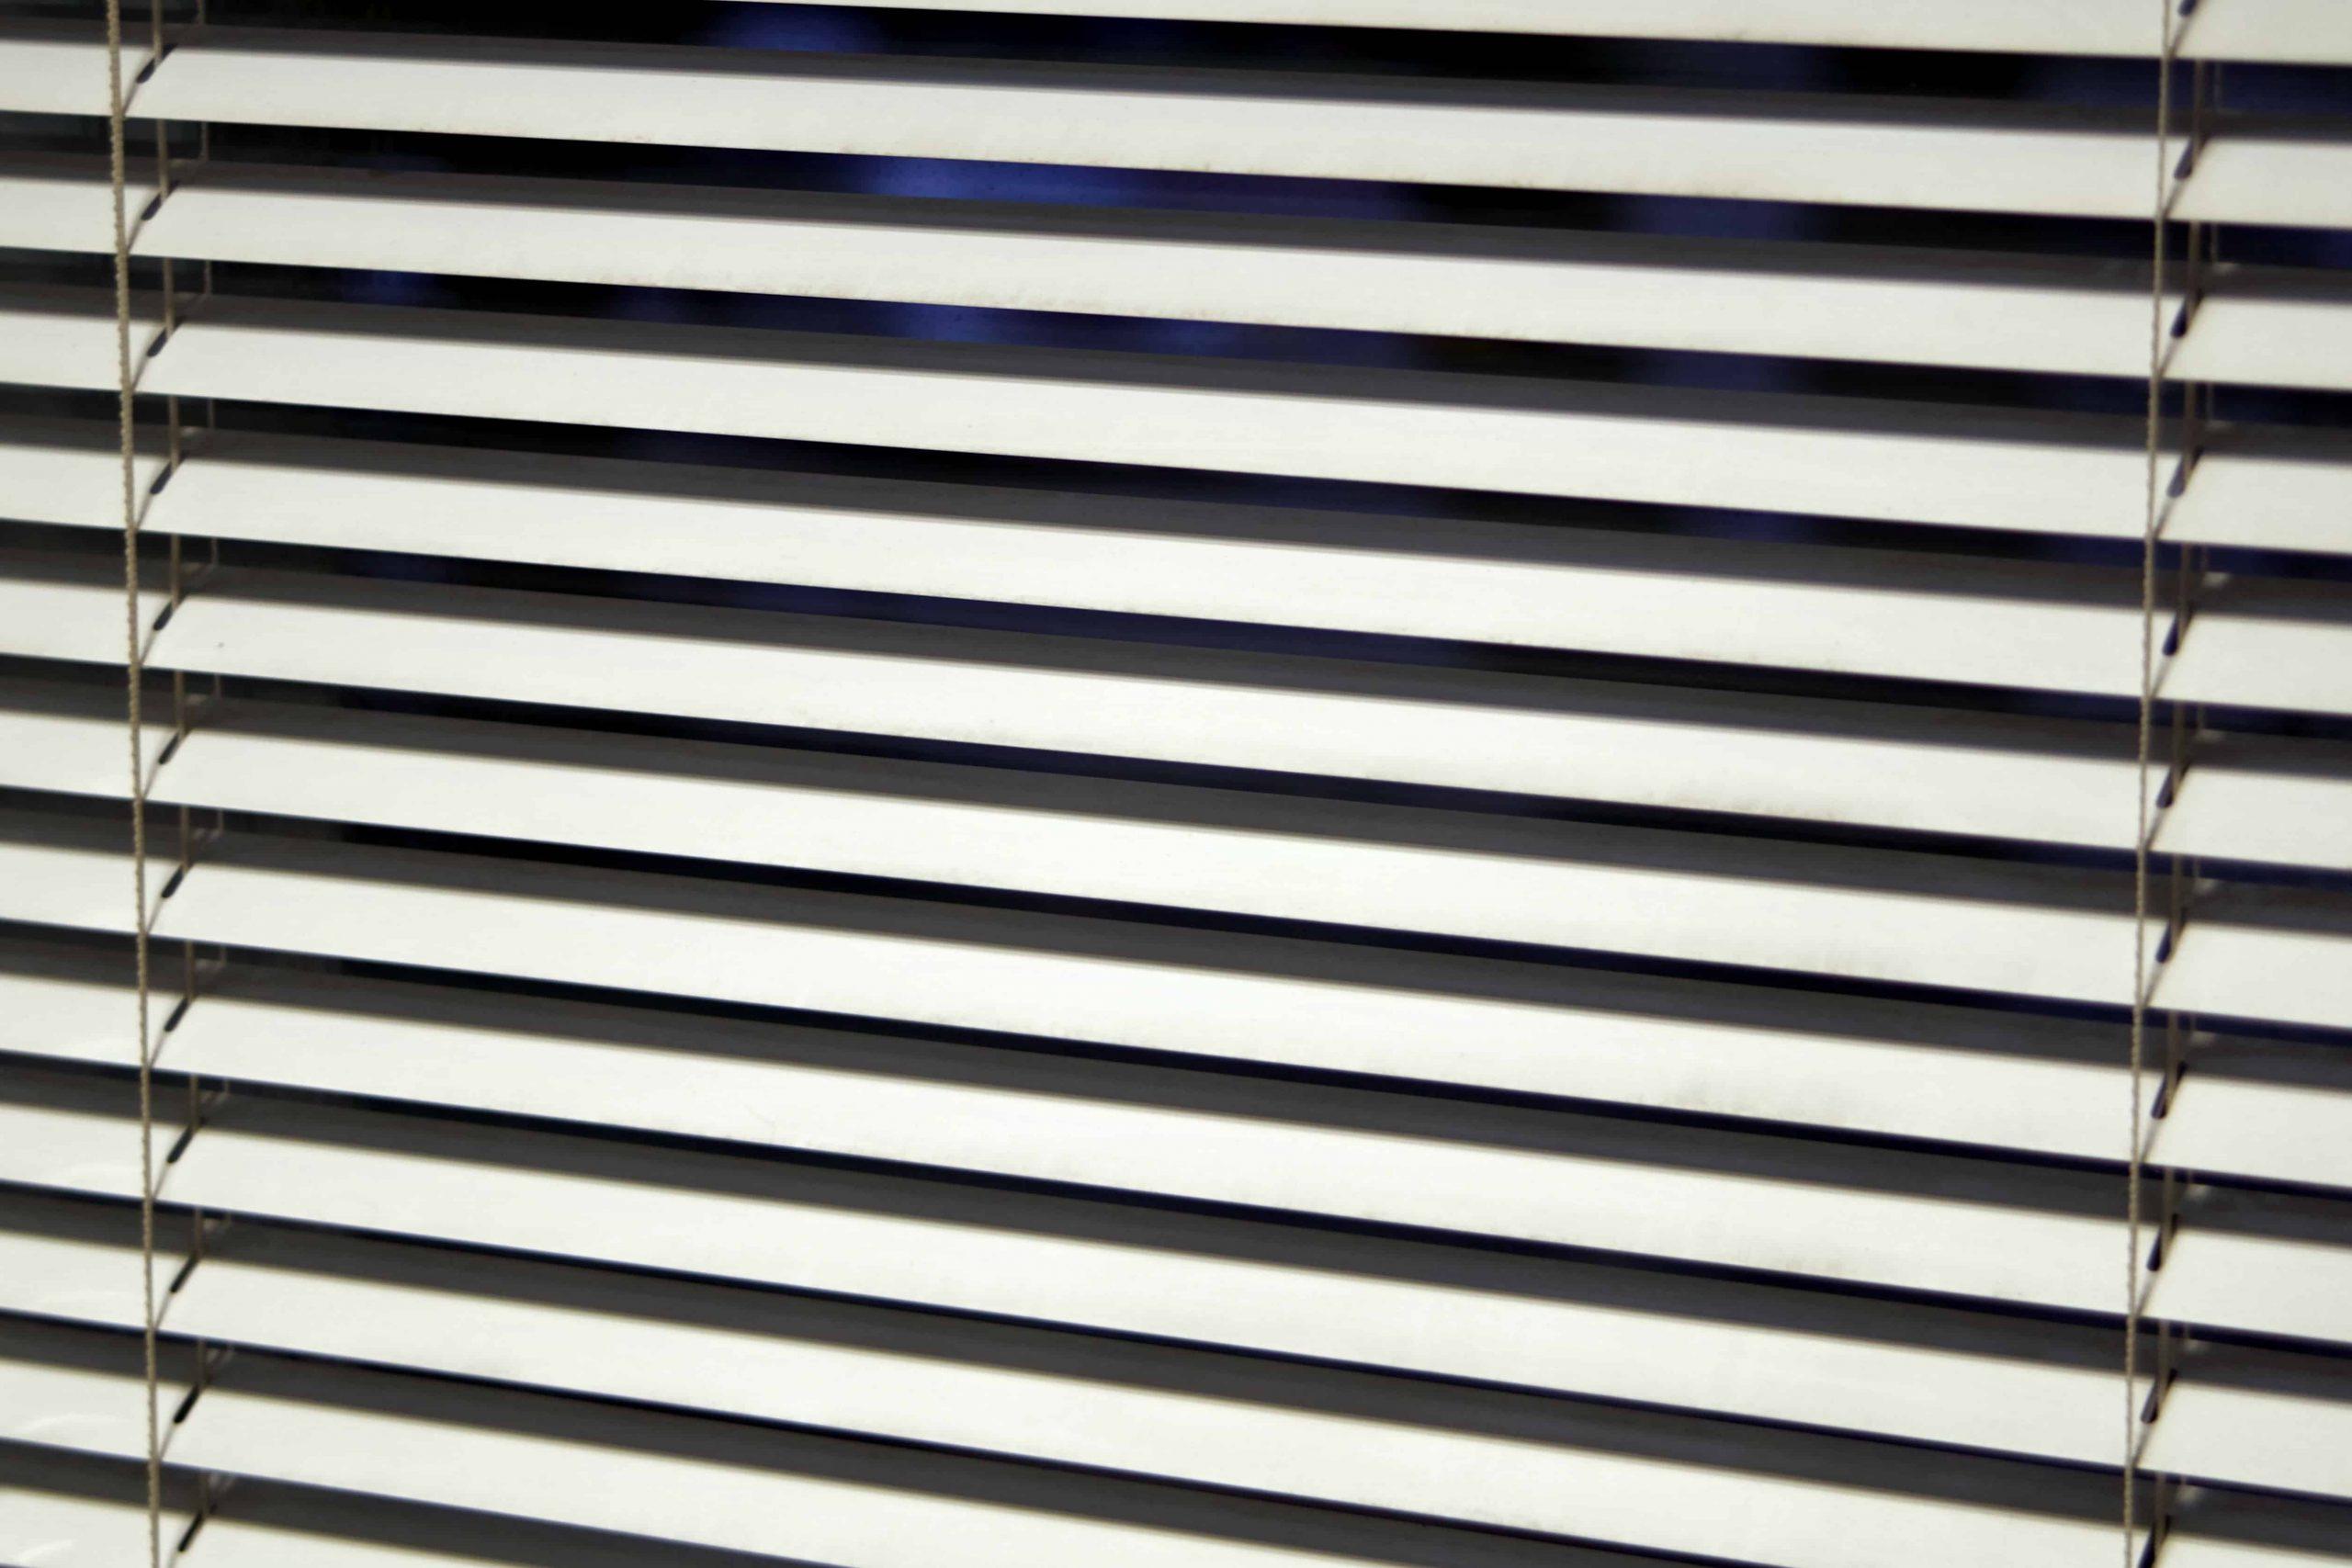 Full Size of Fenster Jalousien Innen Fensterrahmen Ohne Bohren Bauhaus Plissee Ersatzteile Verdunkelung Ikea Rollo Holz Elektrisch Rollos Obi Montage Montieren Jalousie Fenster Fenster Jalousien Innen